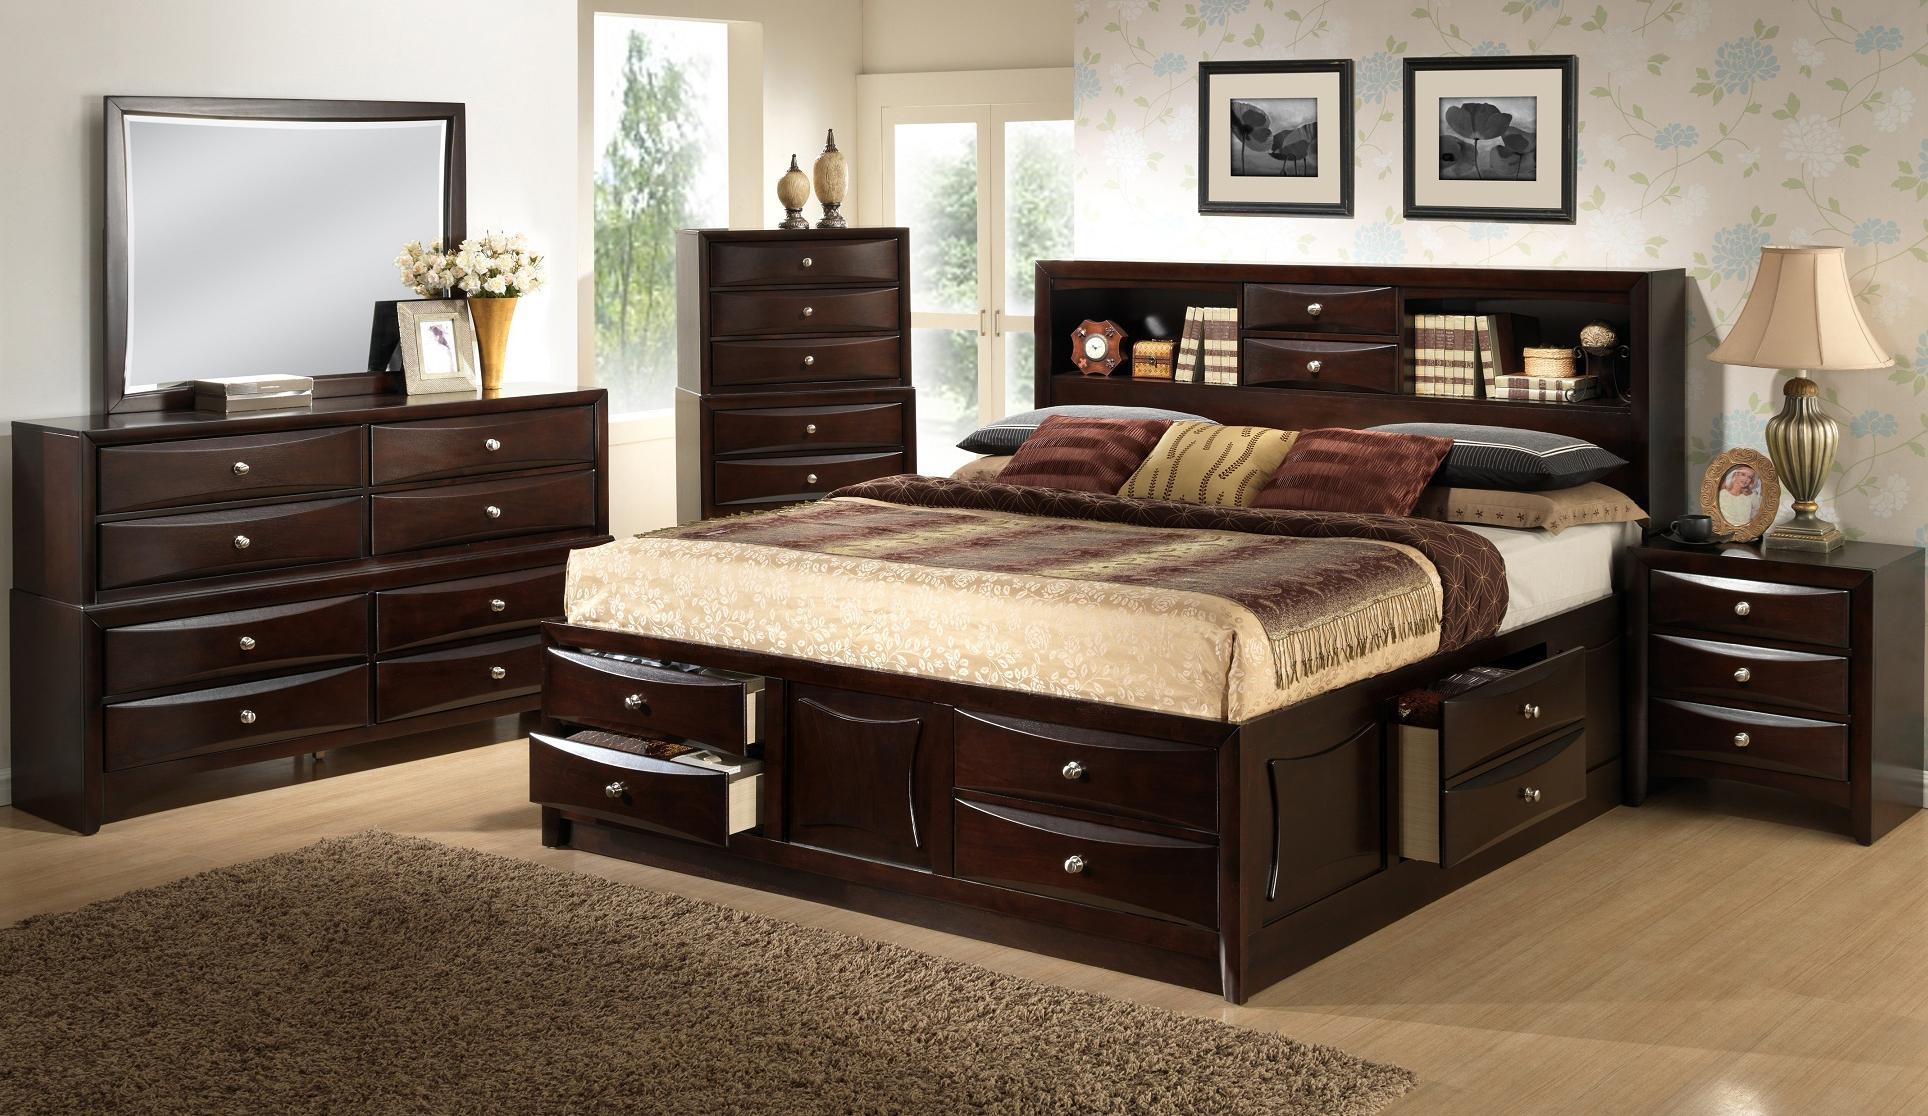 Lifestyle C King California King Storage Bed W